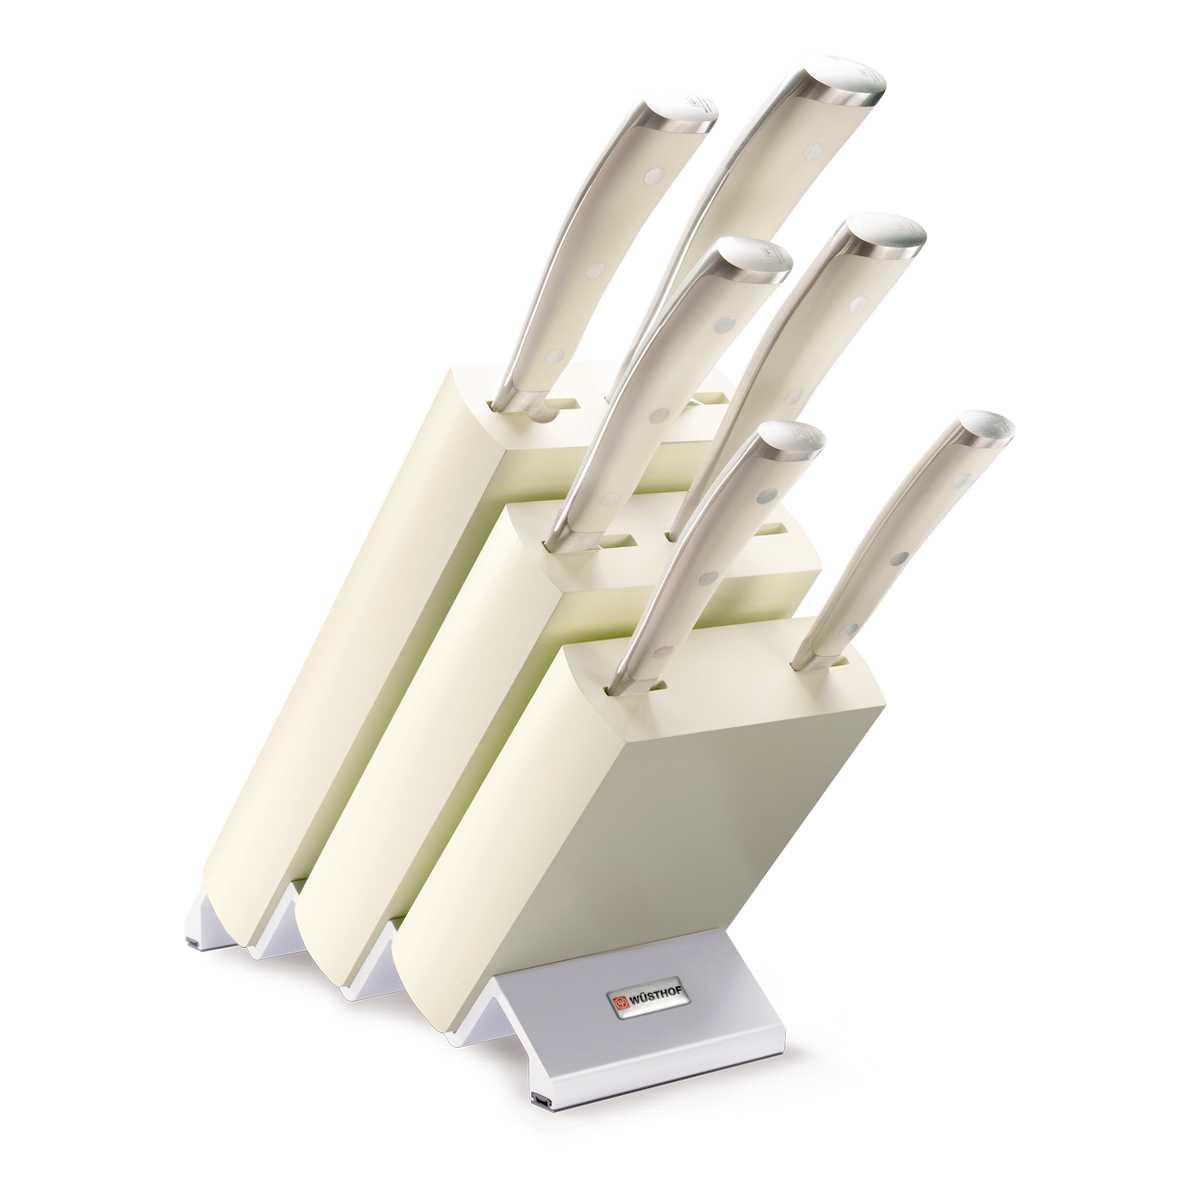 Онлайн каталог PROMENU: Набор ножей с блоком Wuesthof Classic Ikon Creme, кремовый, 7 предметов Wuesthof 9877